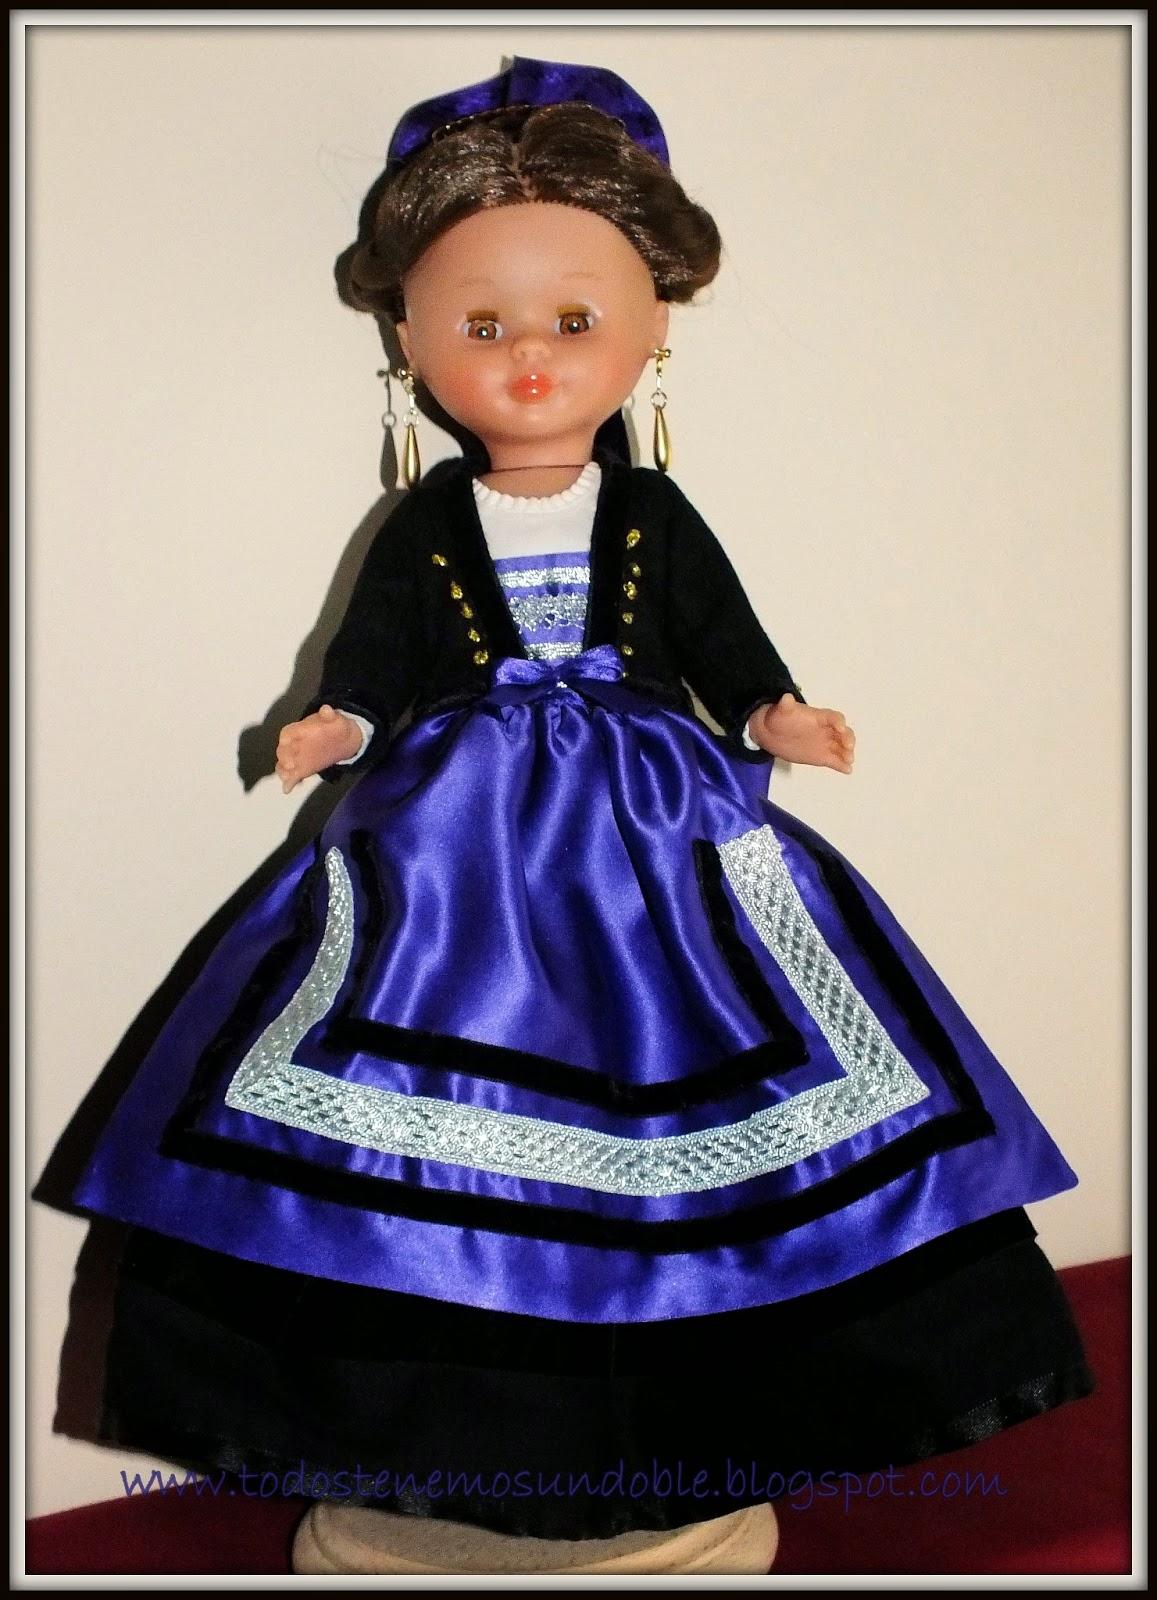 El vestir tradicional burgalés en miniatura: enero 2014